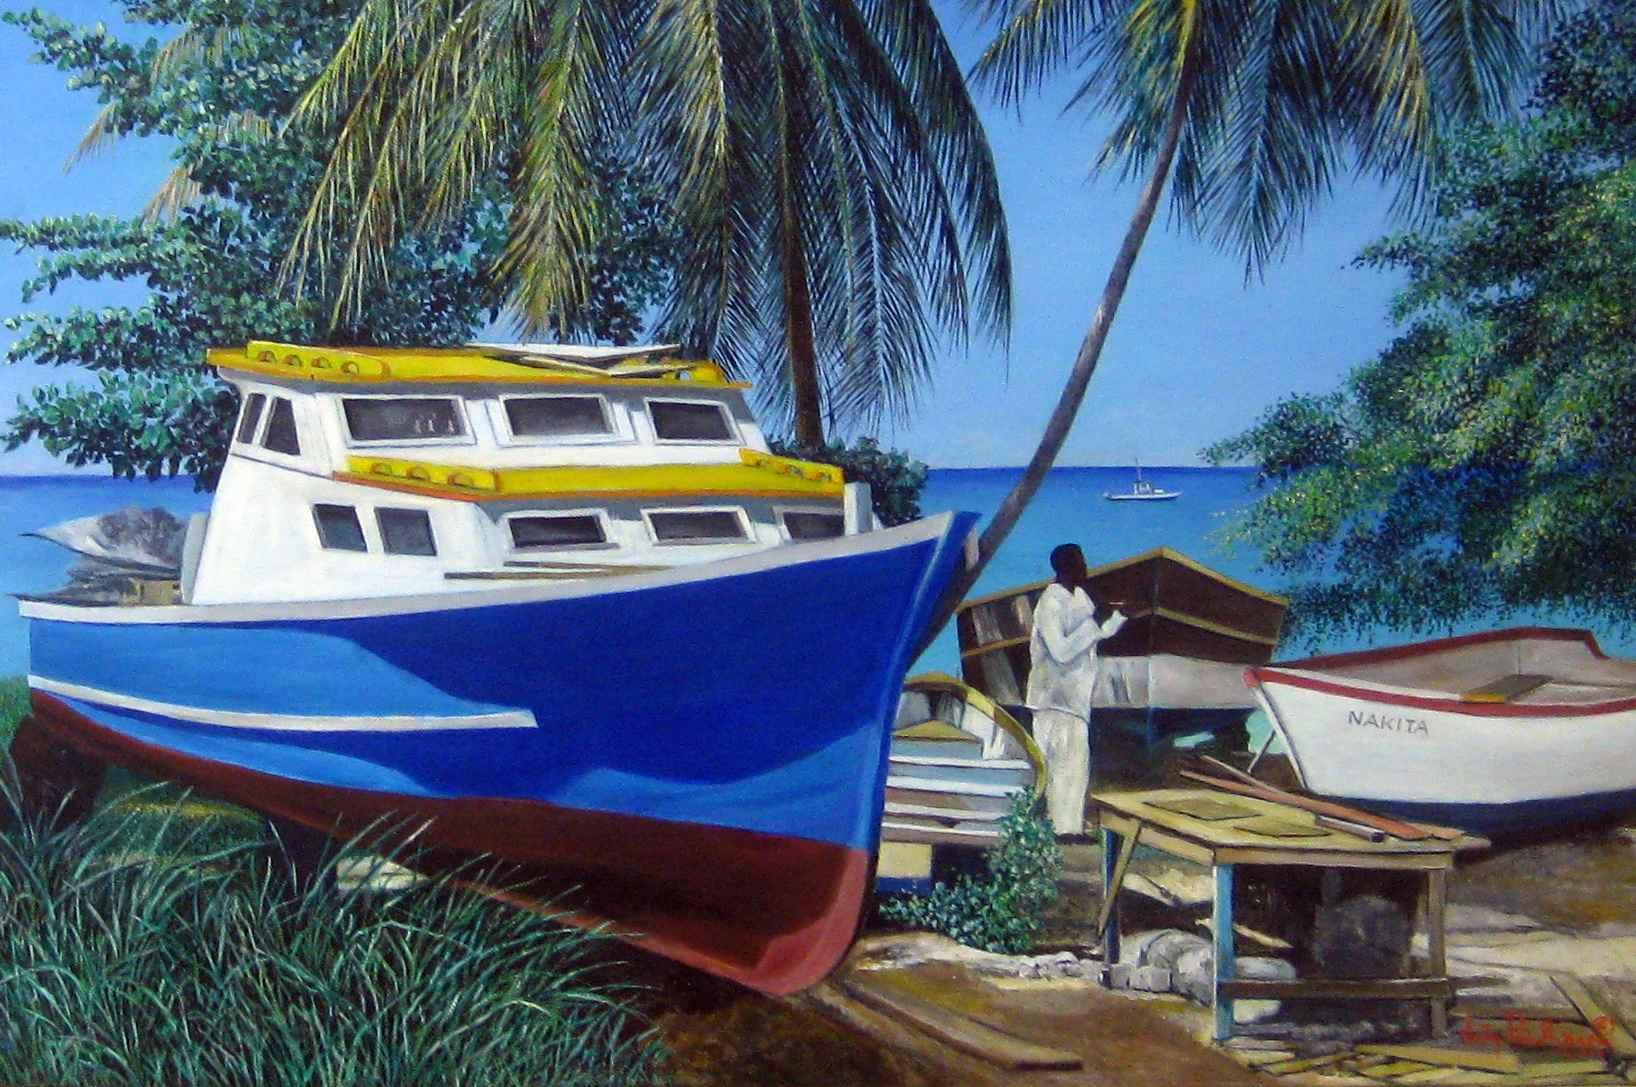 Repairing Boats at Si... by Mr. Virgil Broodhagen - Masterpiece Online